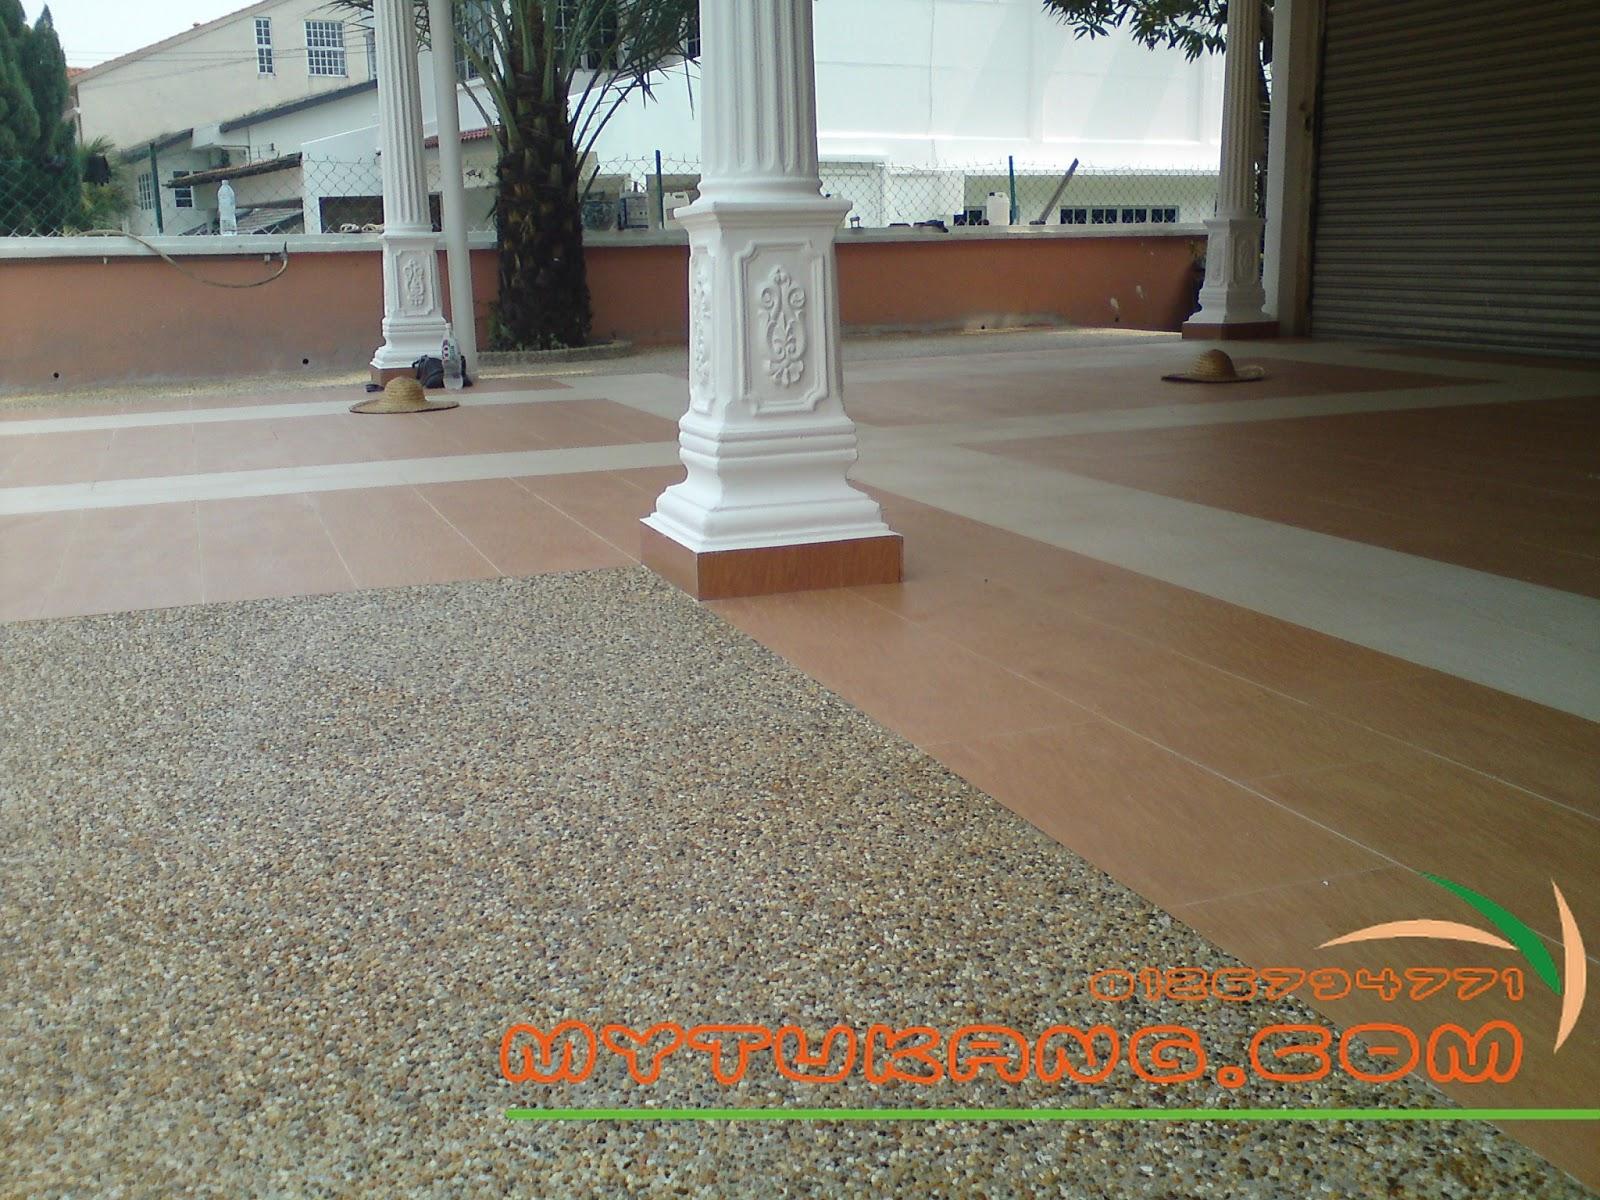 Membuat Kerja Konkrit Lantai Memasang Batu Kacang Pebble Wash